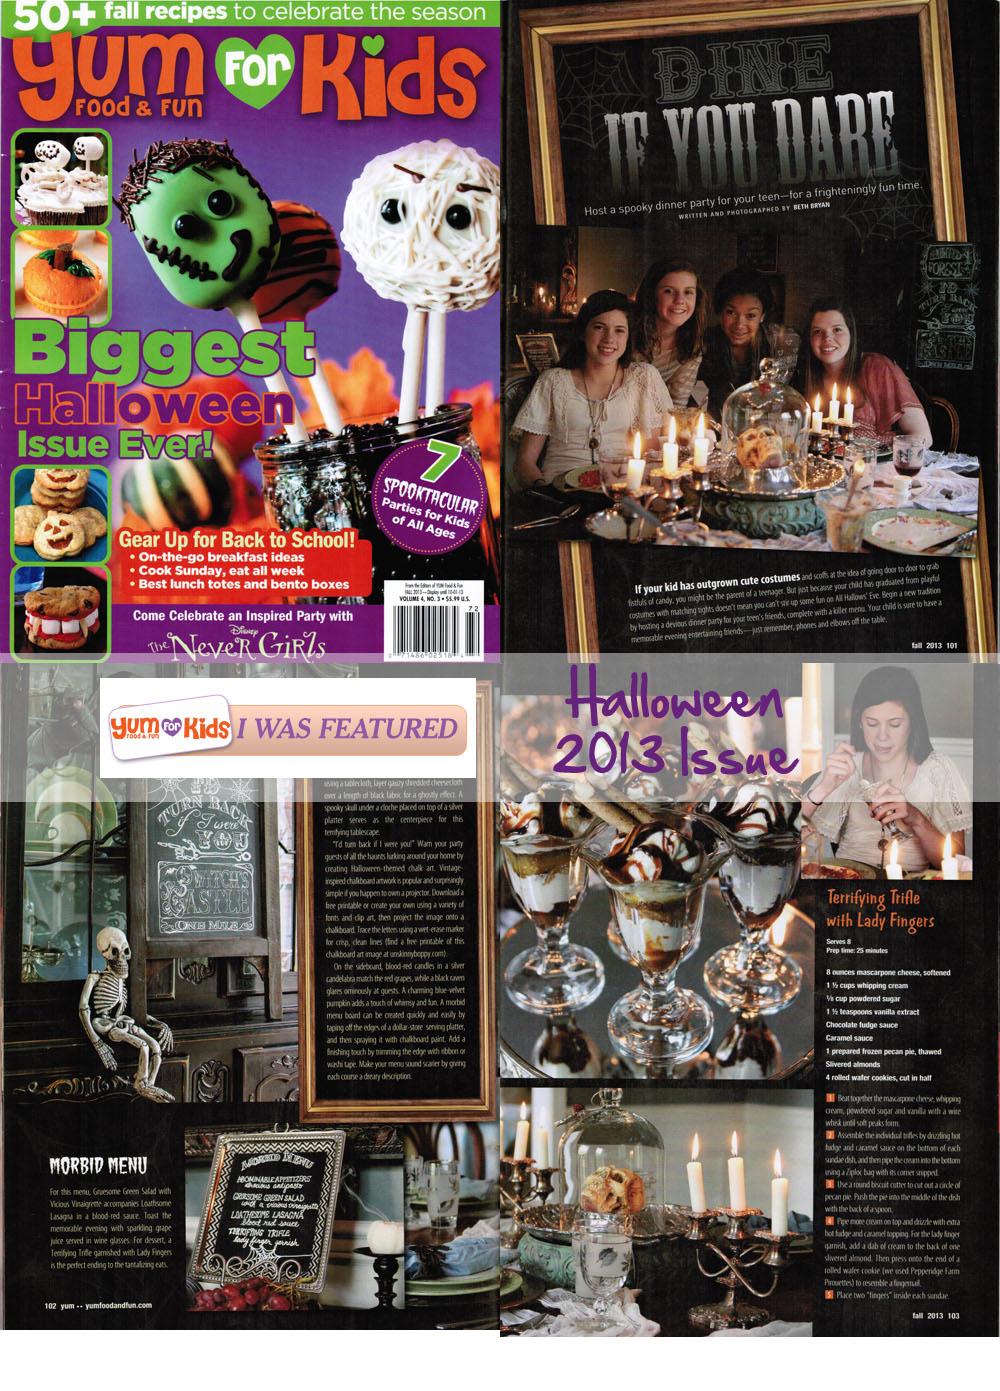 halloween2013_yum_food_and_fun_magazine